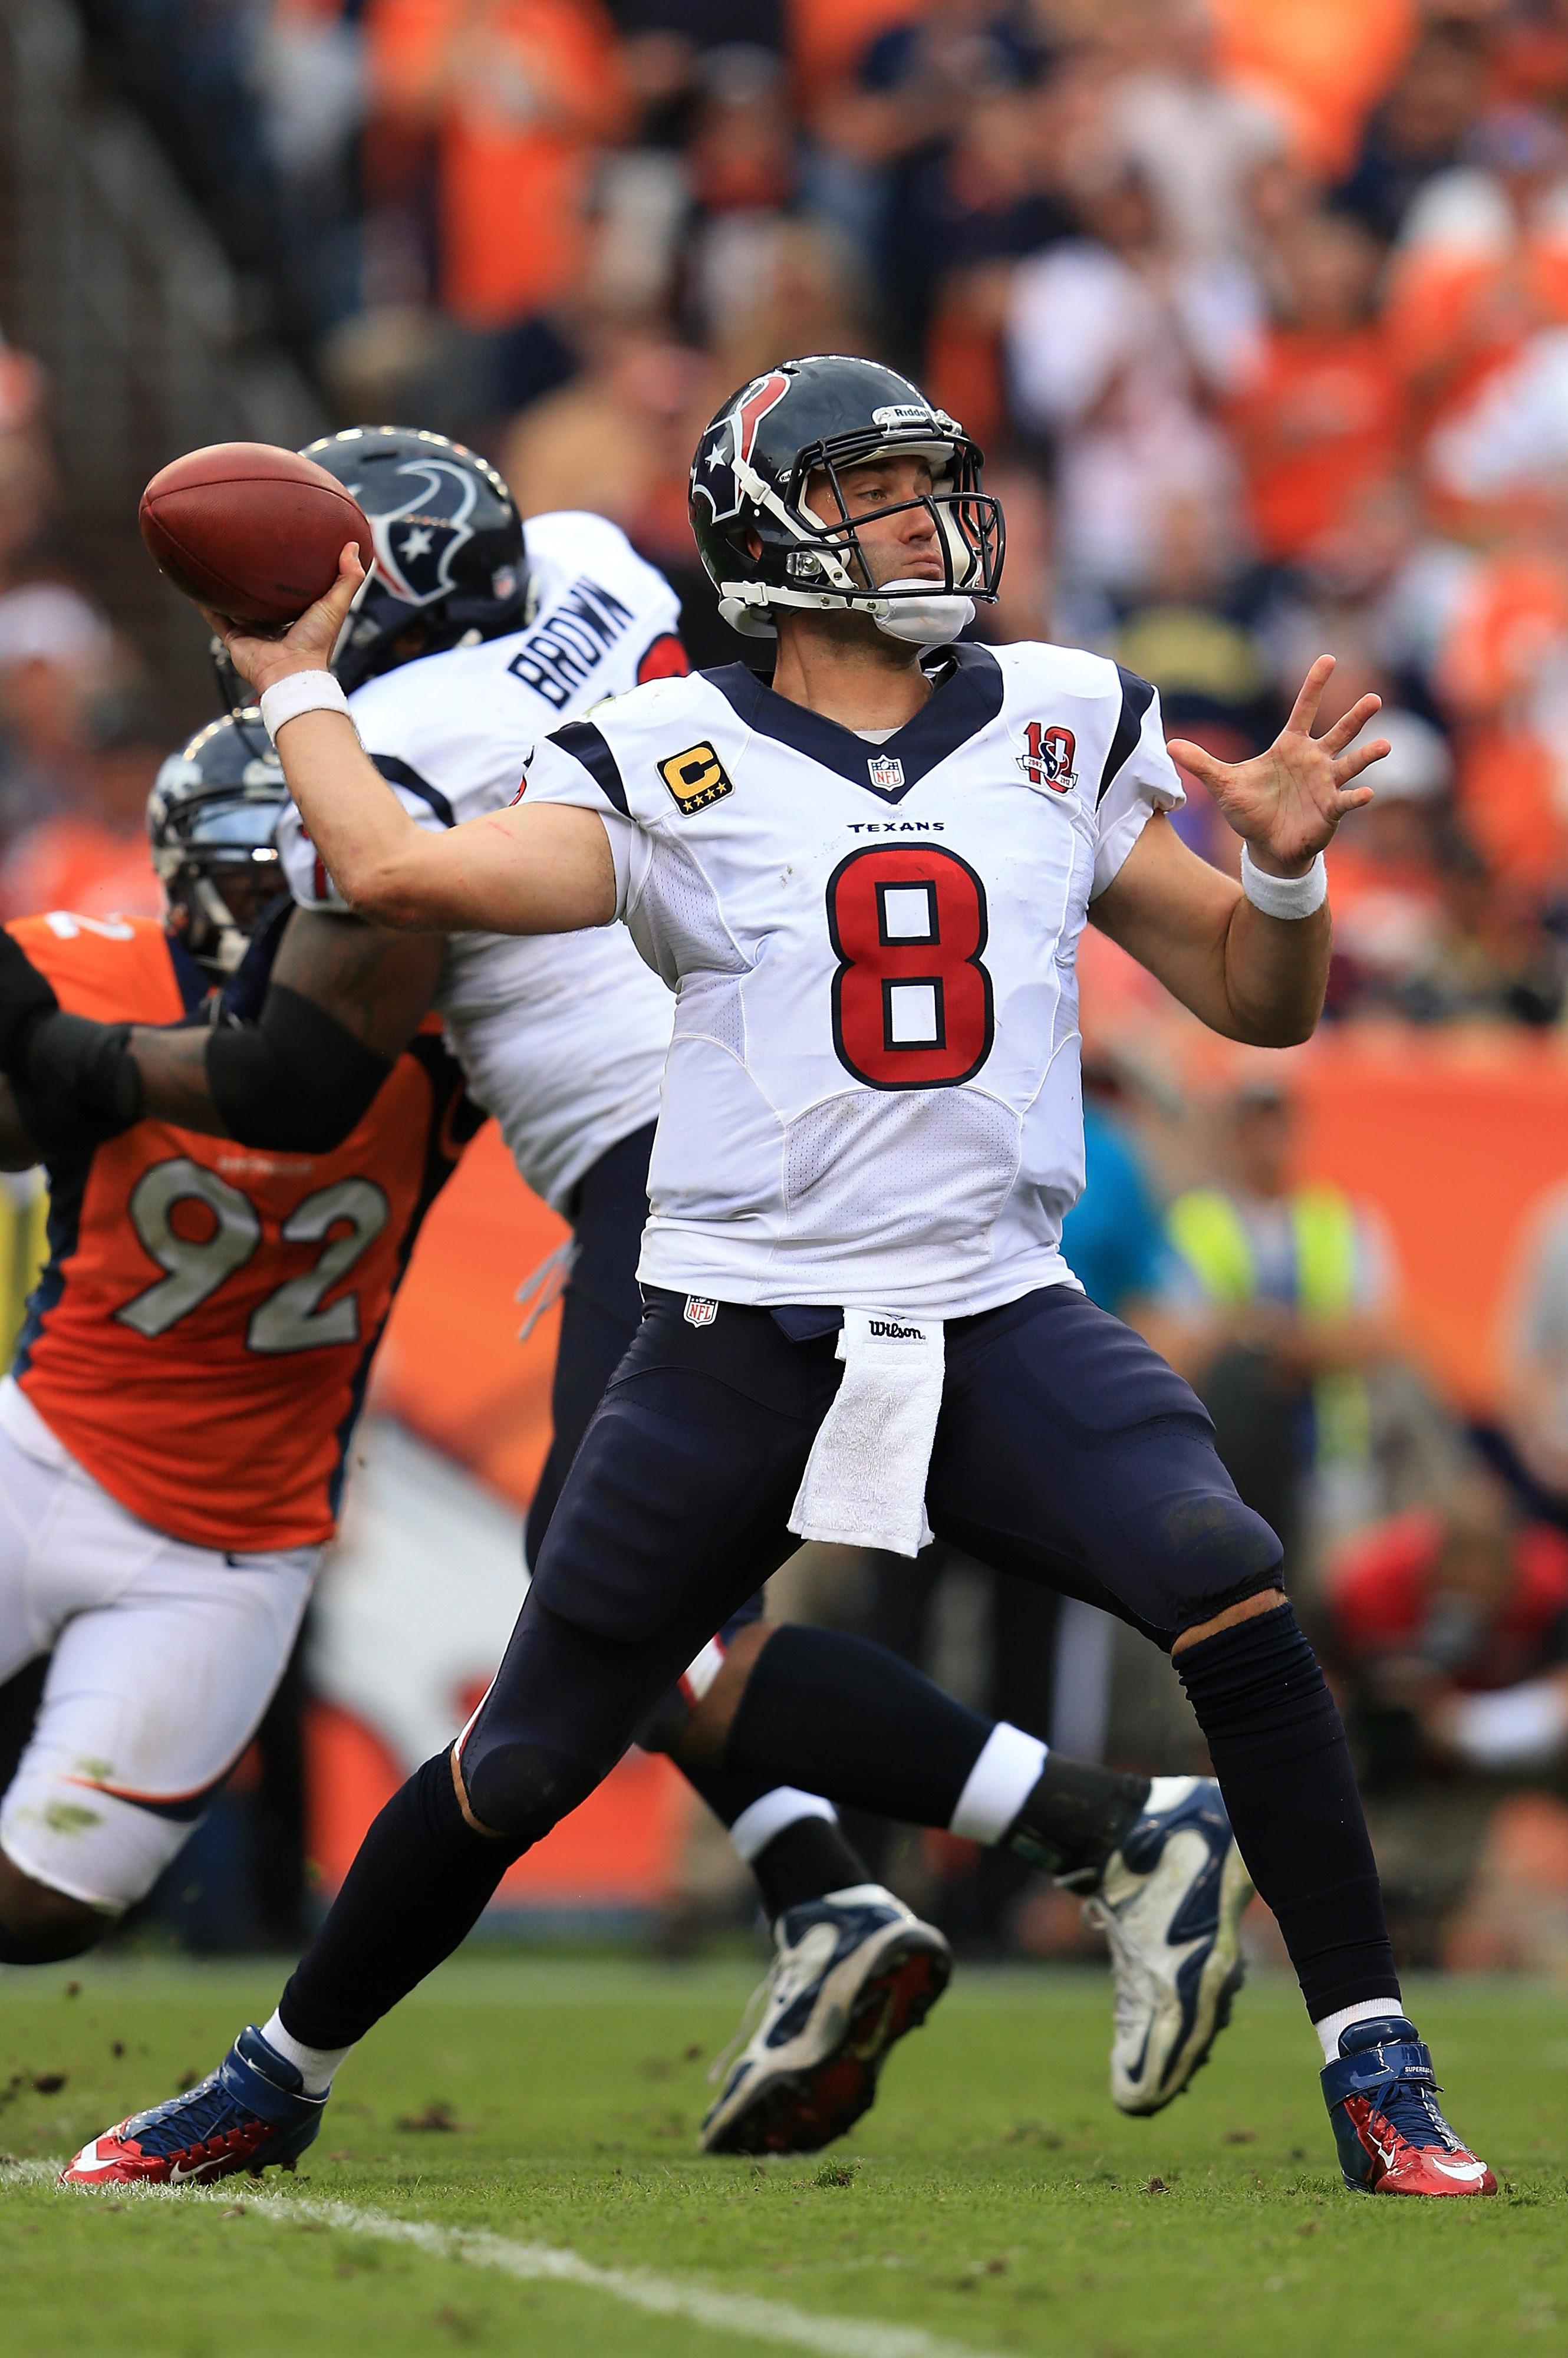 Wiley ol' gunslinger Matt Schaub returns to face the Denver Broncos in the last home game of the season.